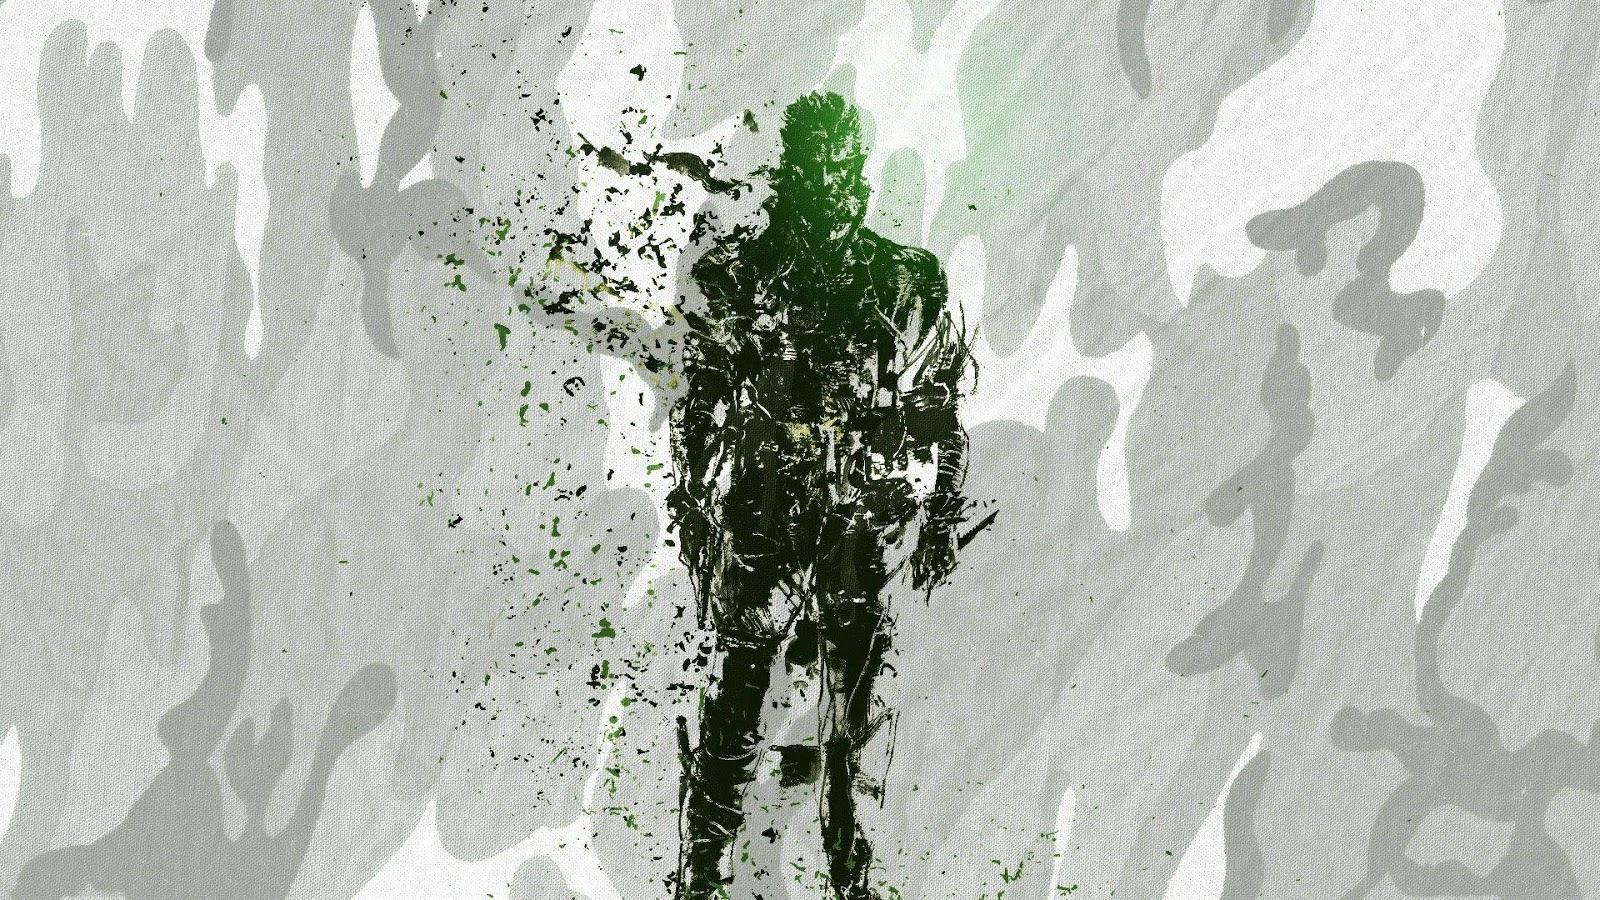 Metal Gear Solid Wallpapers